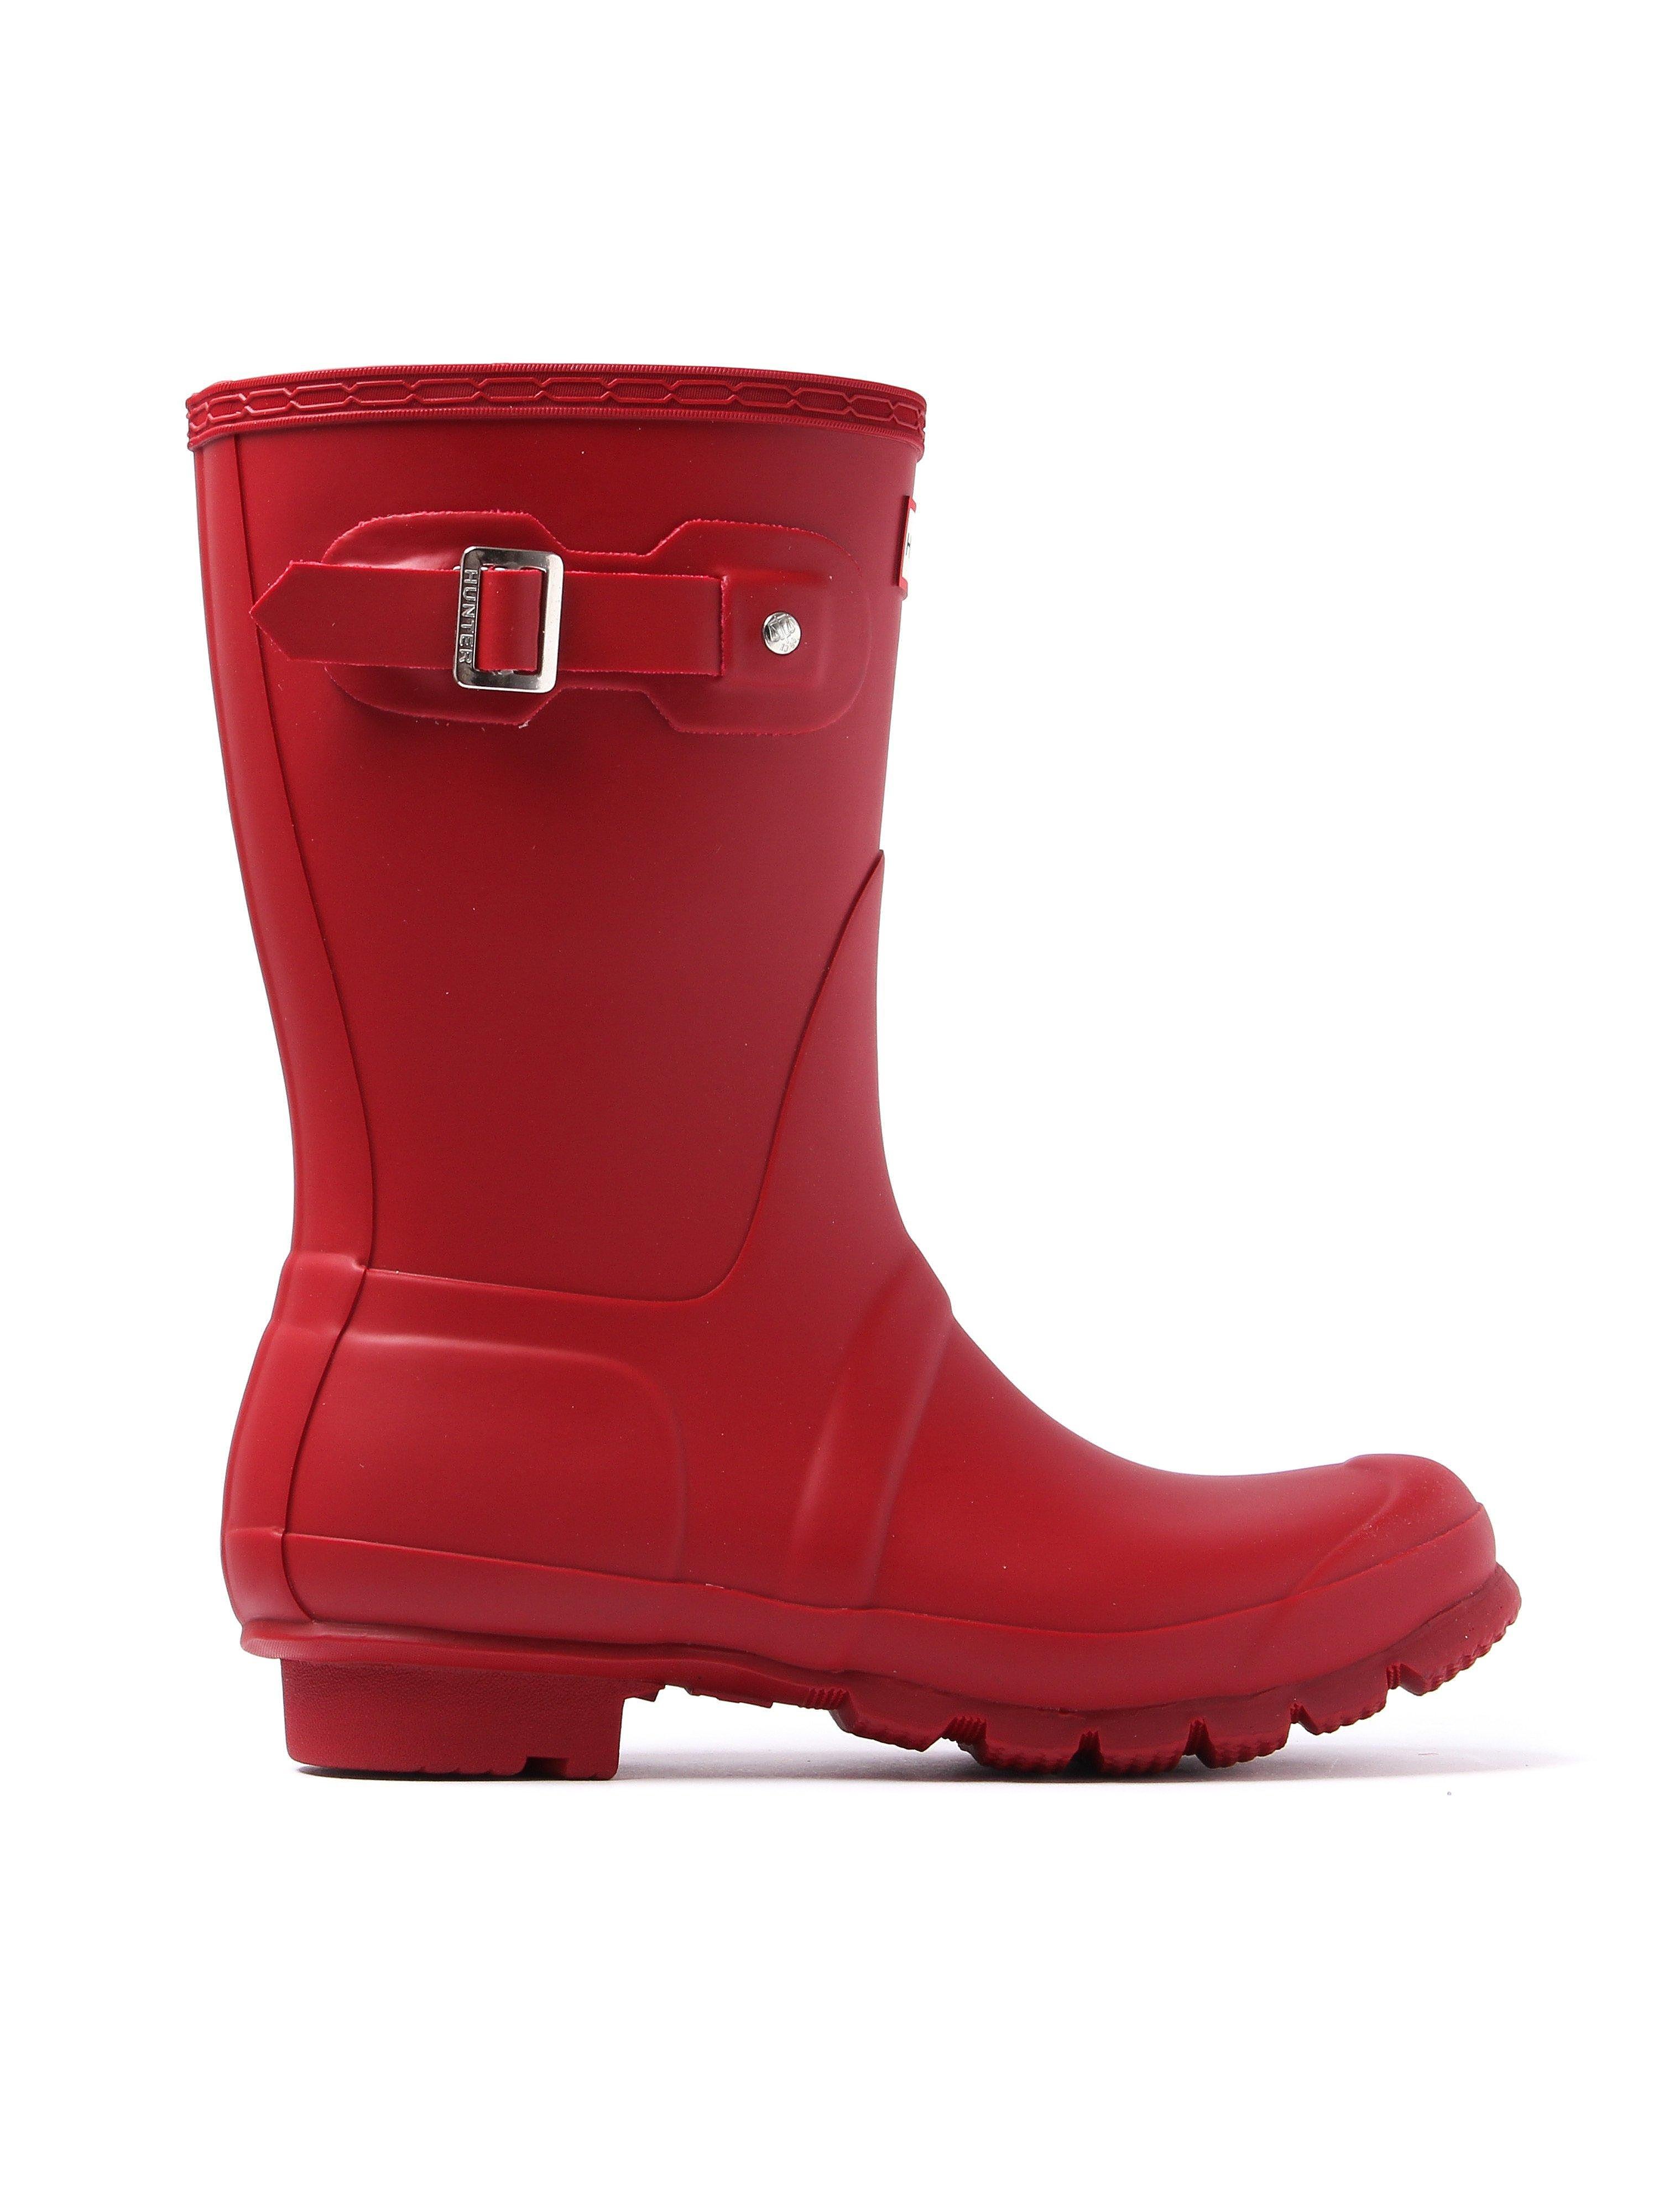 Hunter Wellies Women's Original Short Wellington Boots - Military Red